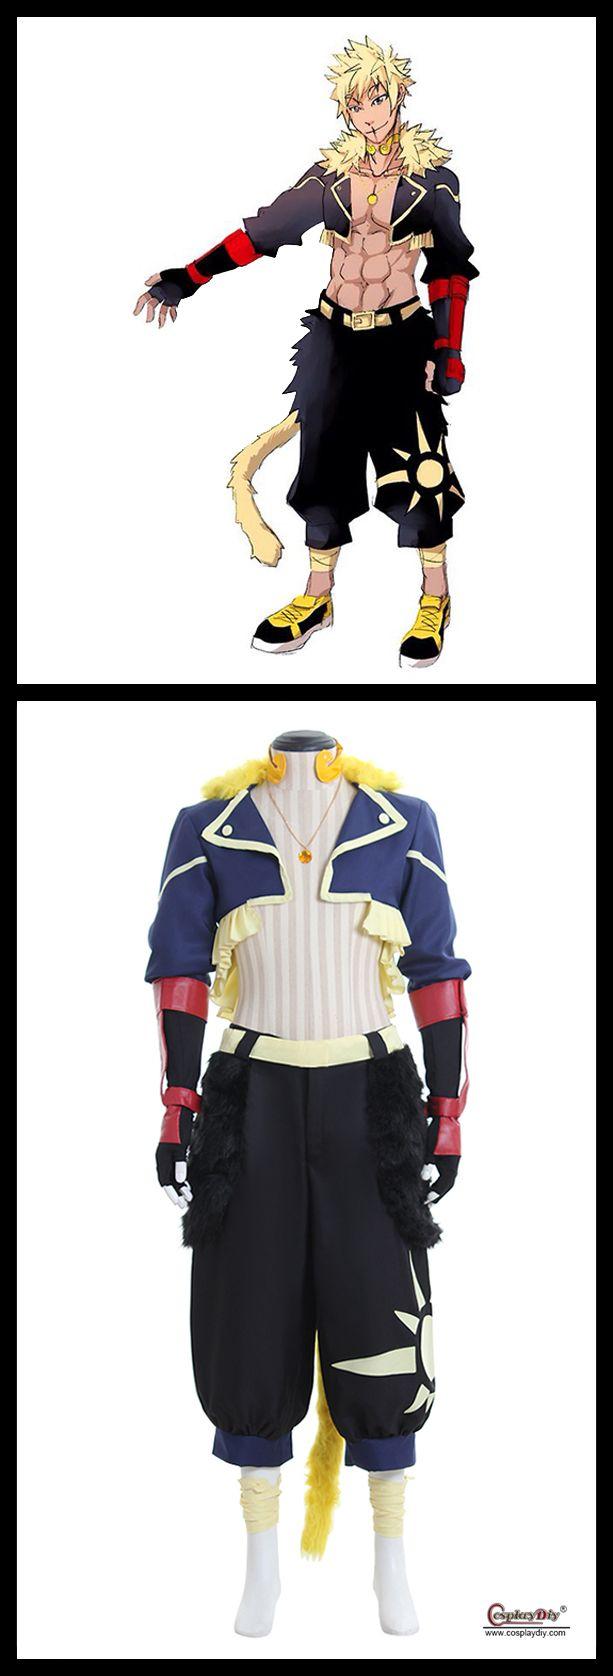 Anime RWBY Sun Wukong Custom Made Costume Cosplay Adult's Jacket Pants Gloves Cosplay